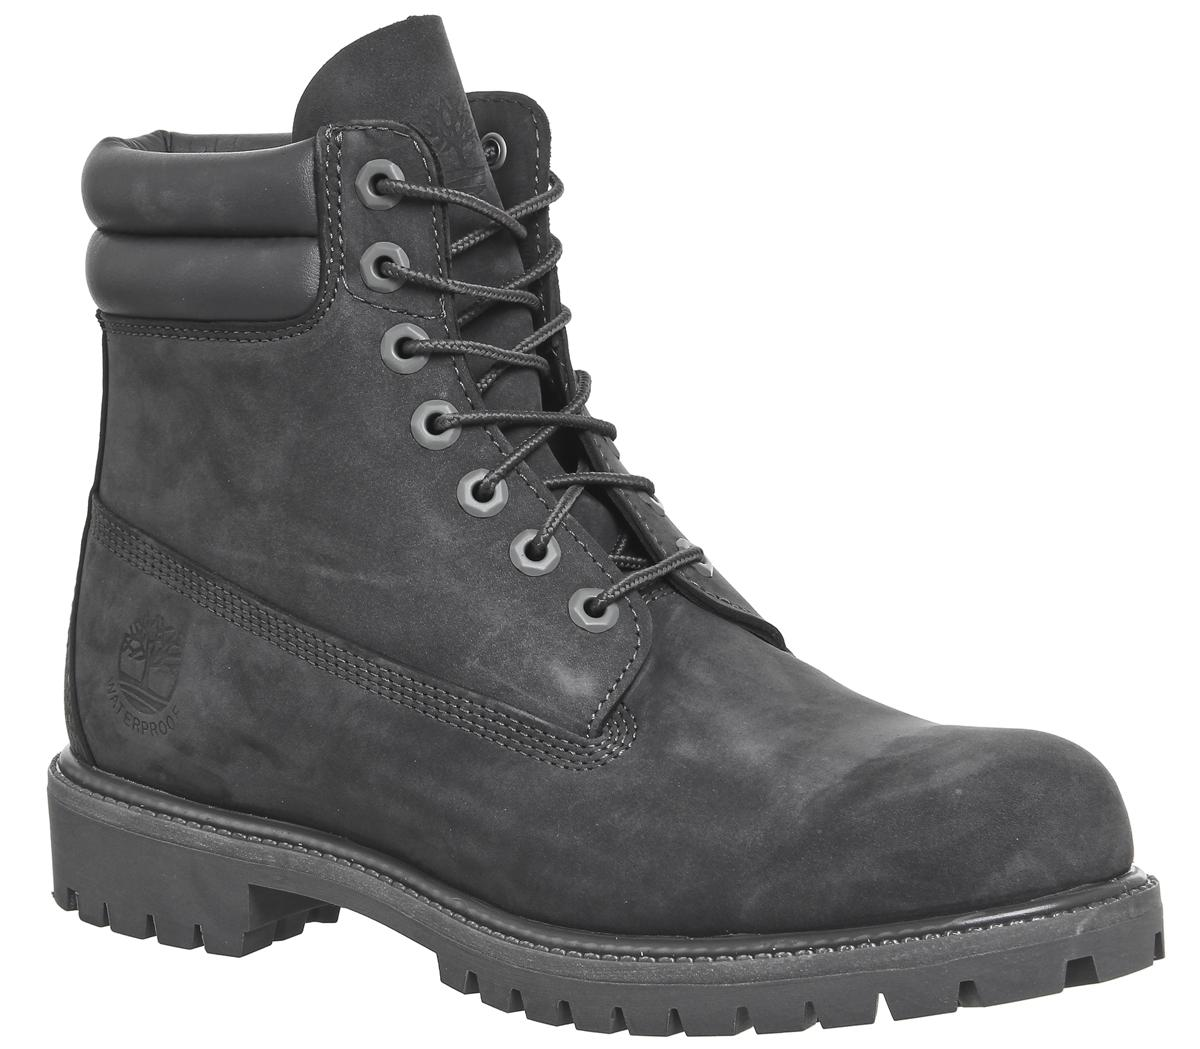 medios de comunicación pago detergente  Timberland 6 Inch Double Collar Boots Dark Grey - Boots